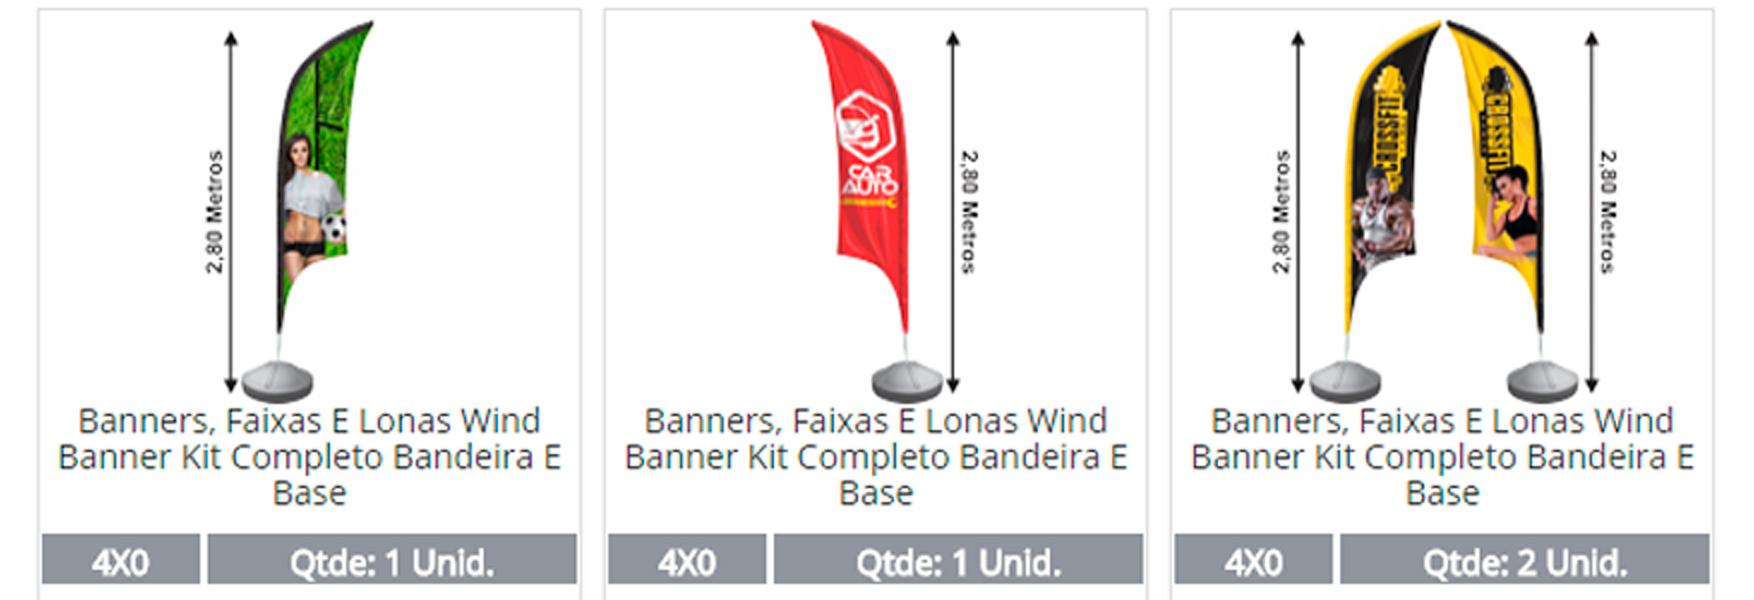 flagball-banner-wind-banner-vela-bhmg